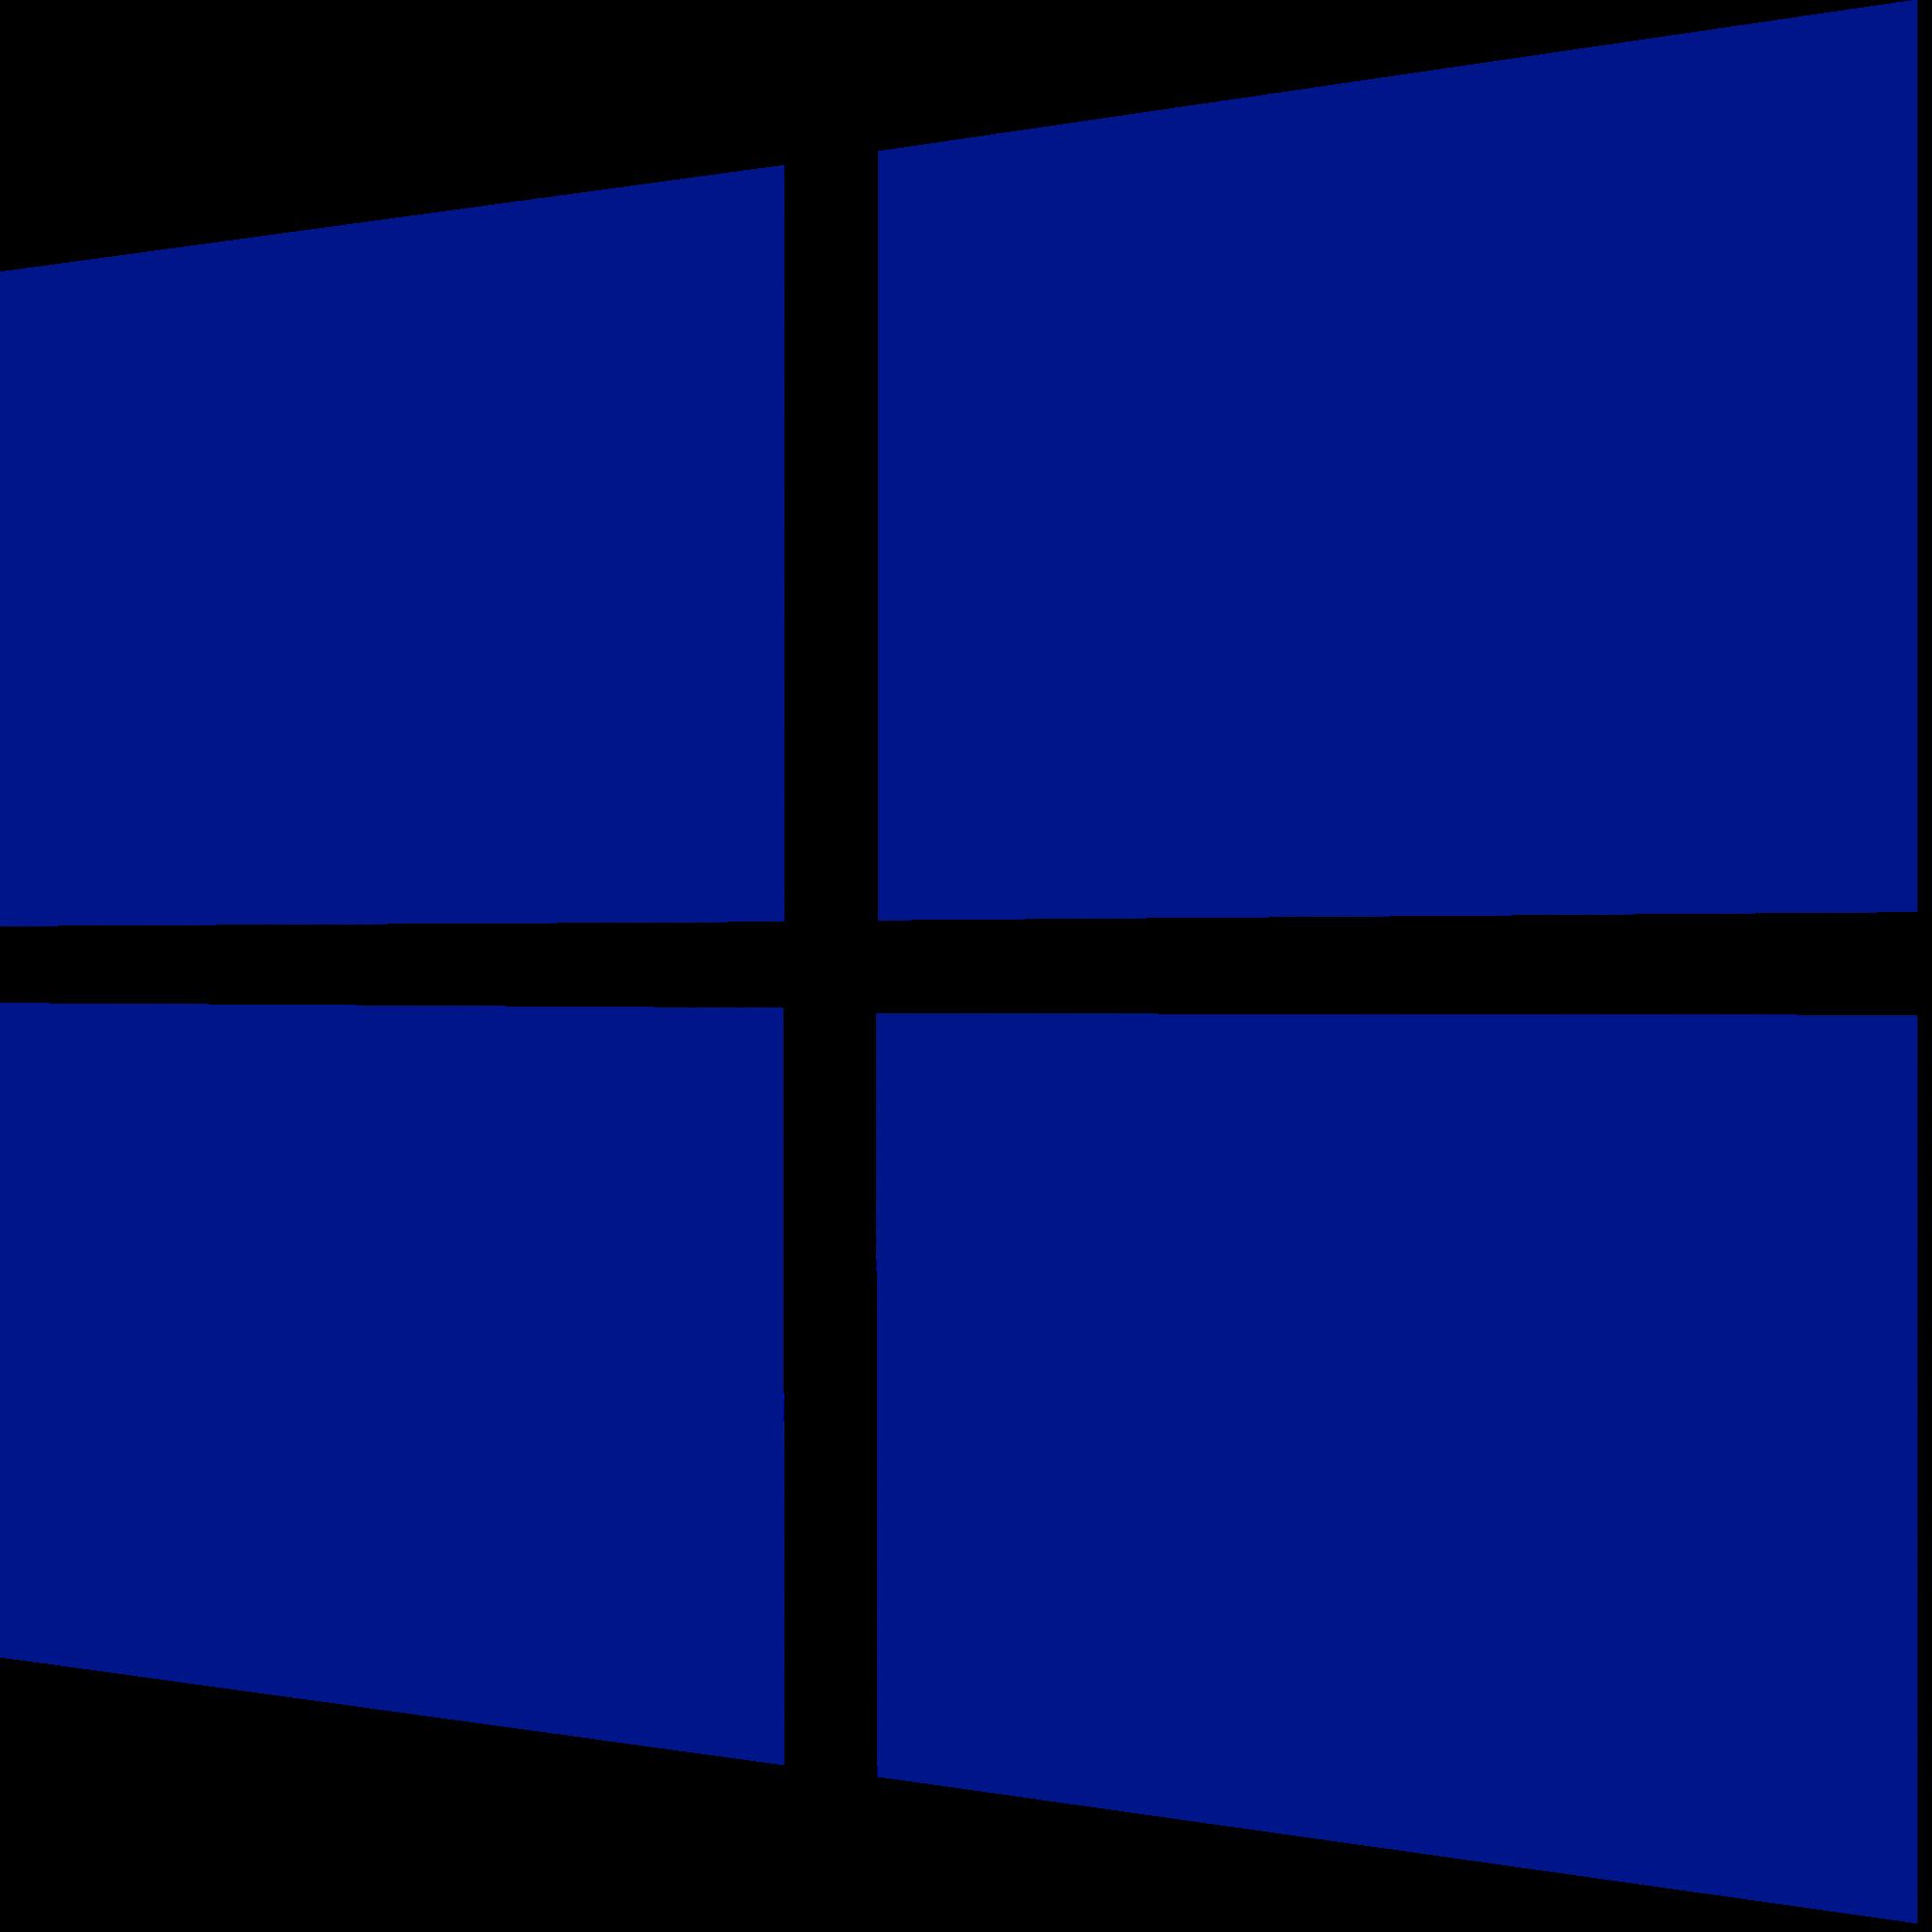 Windows logo png. File blue purple svg